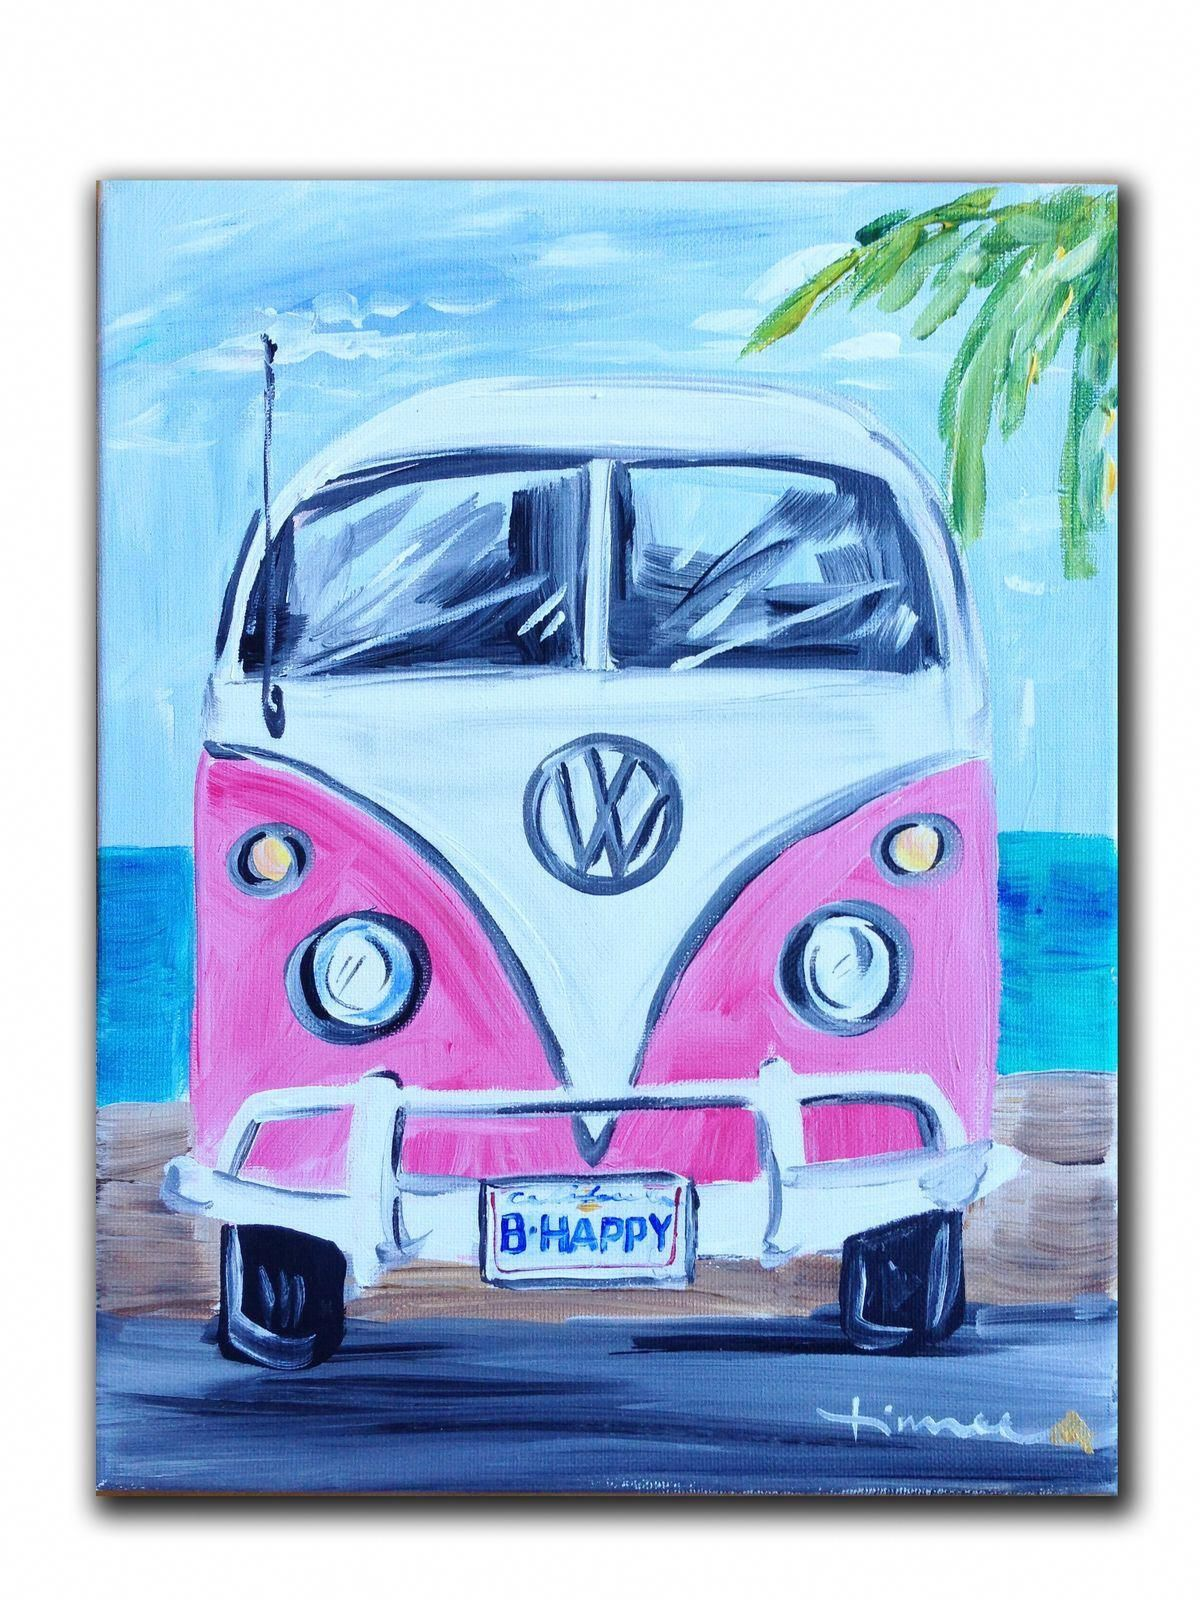 Vw Inspiration Art Get That Lisence Buy A Van Make It Mine Buyartartworks Hippie Painting Cute Canvas Paintings Cute Paintings